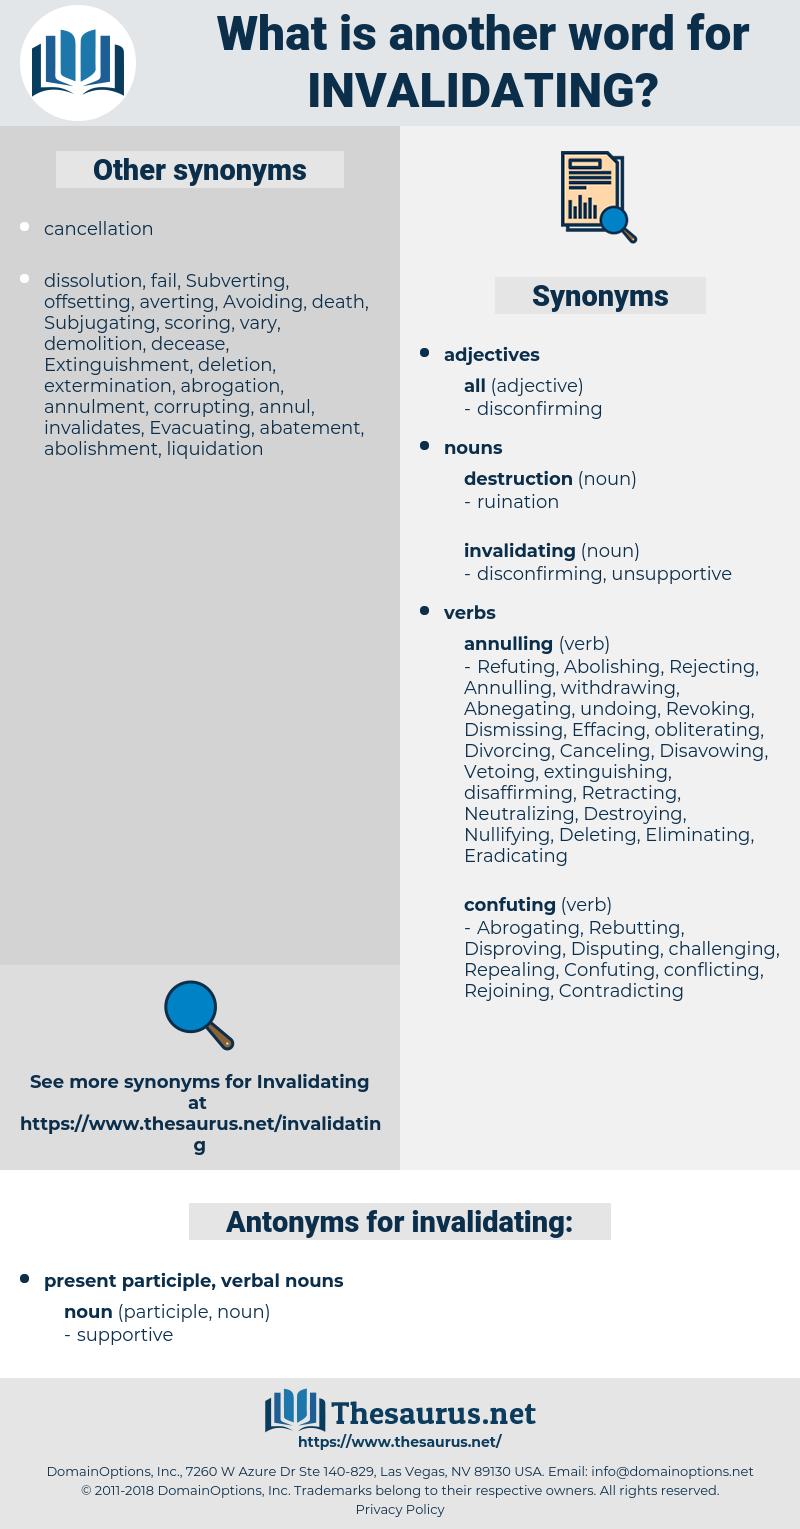 invalidating, synonym invalidating, another word for invalidating, words like invalidating, thesaurus invalidating